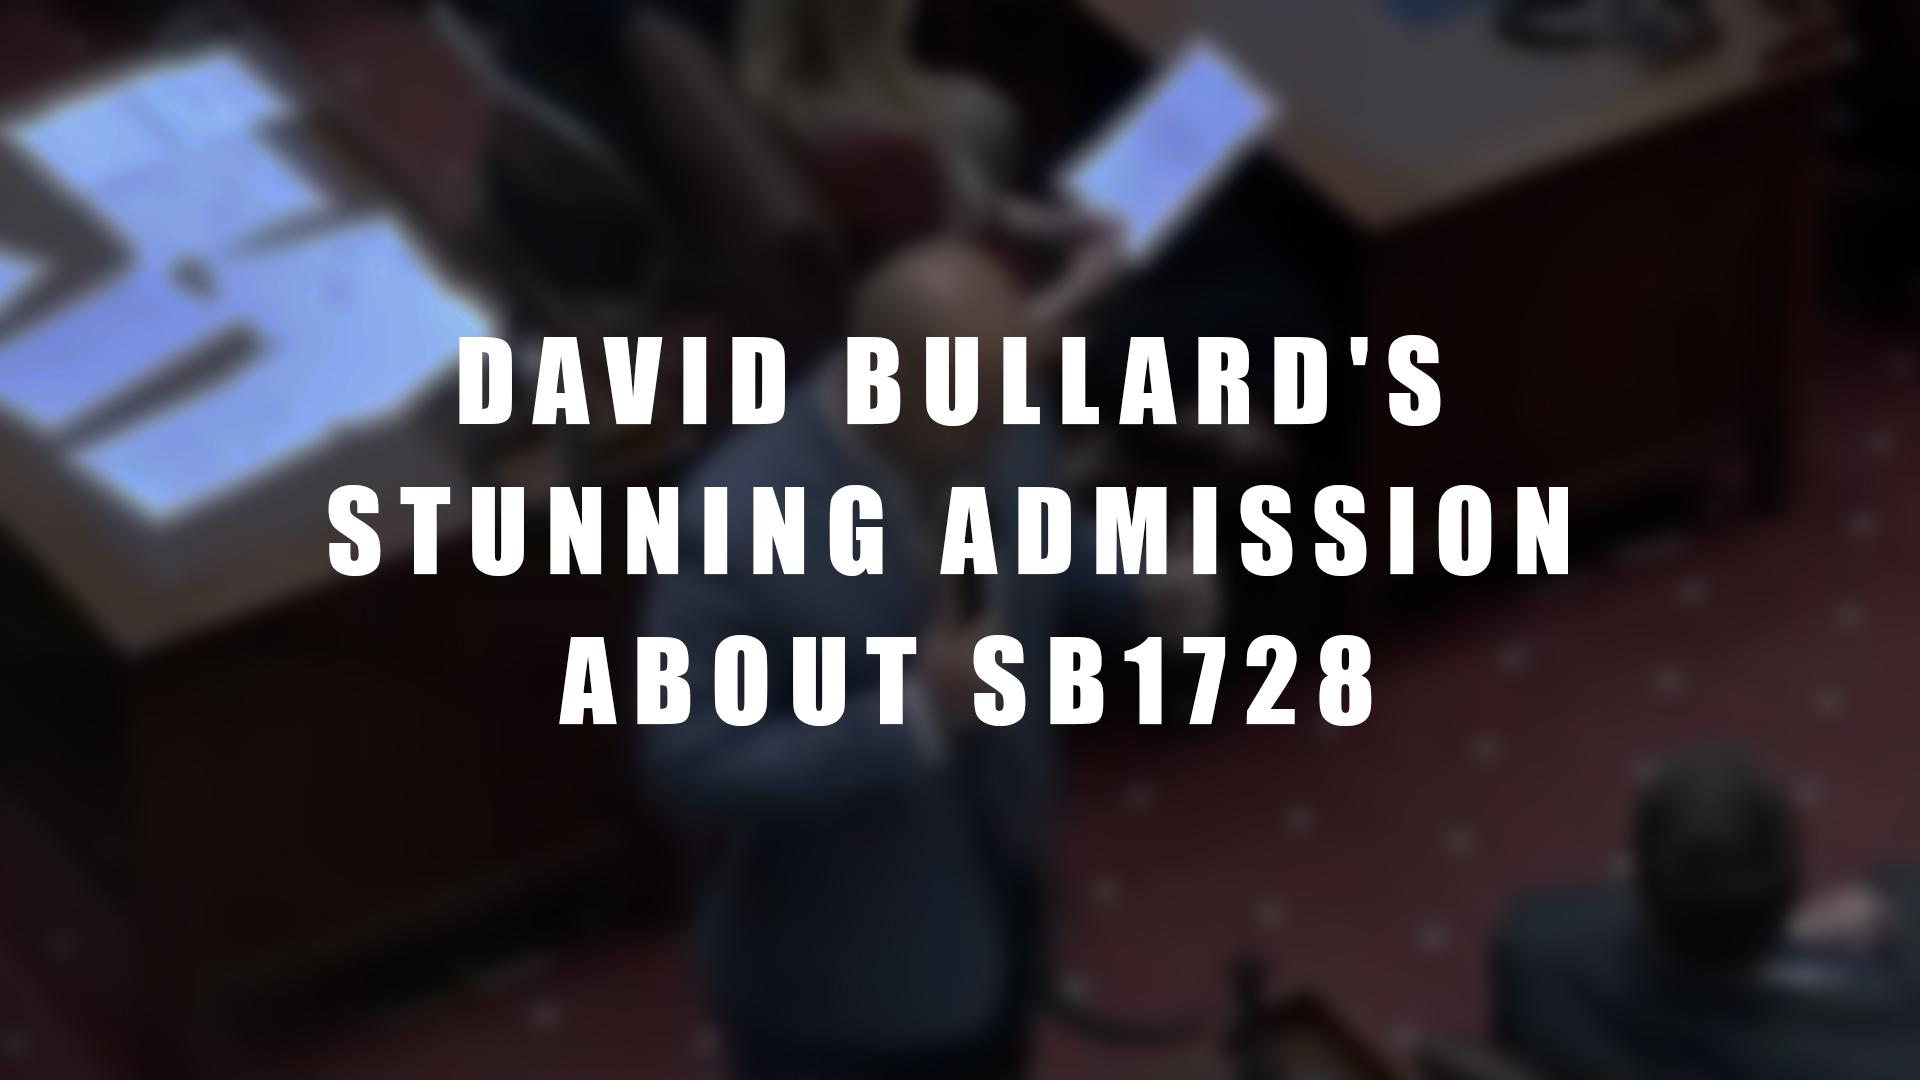 Bullard's Stunning Admission About SB1728